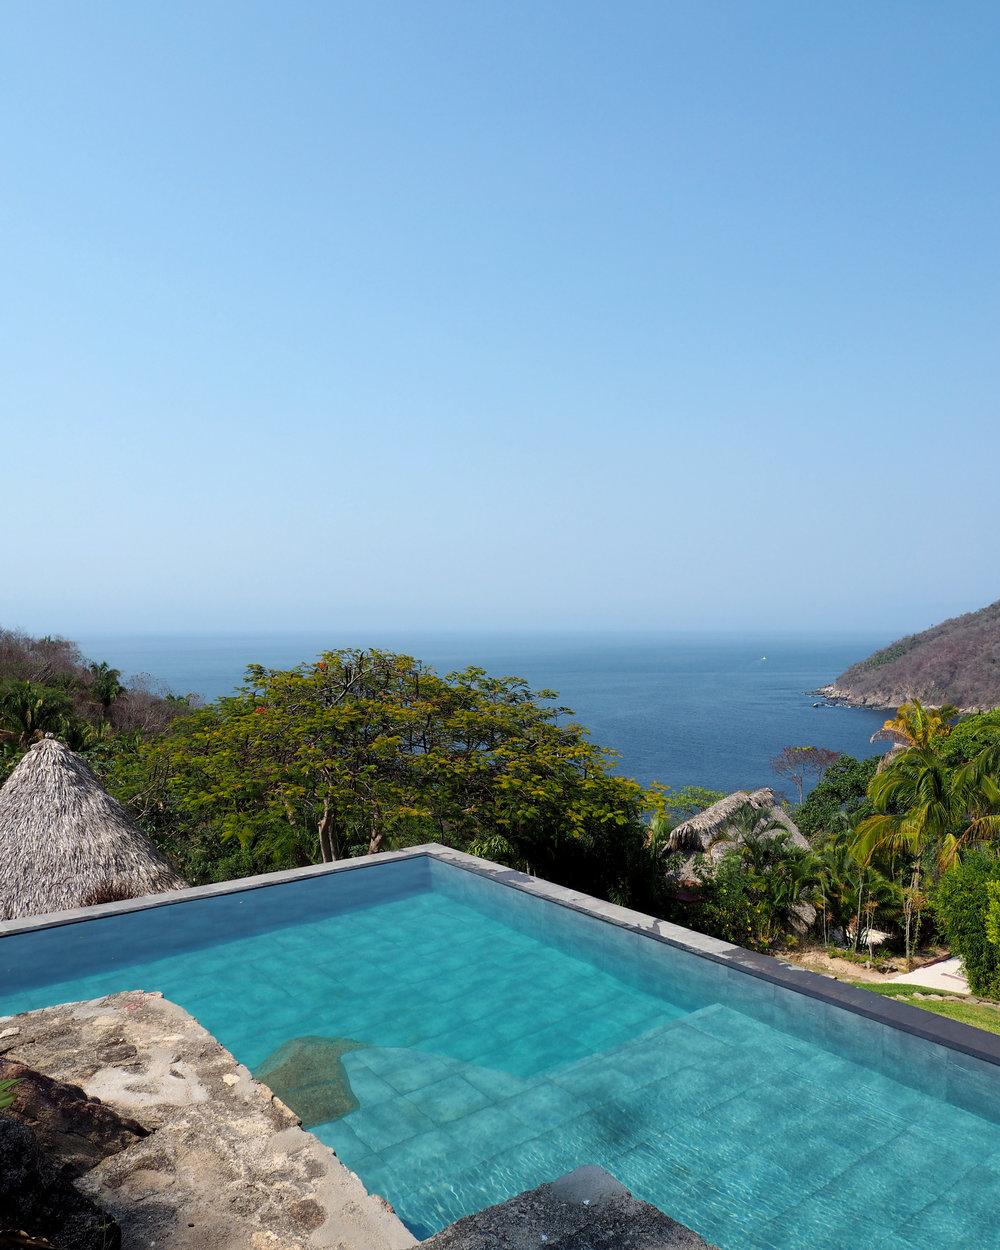 Verana pool view